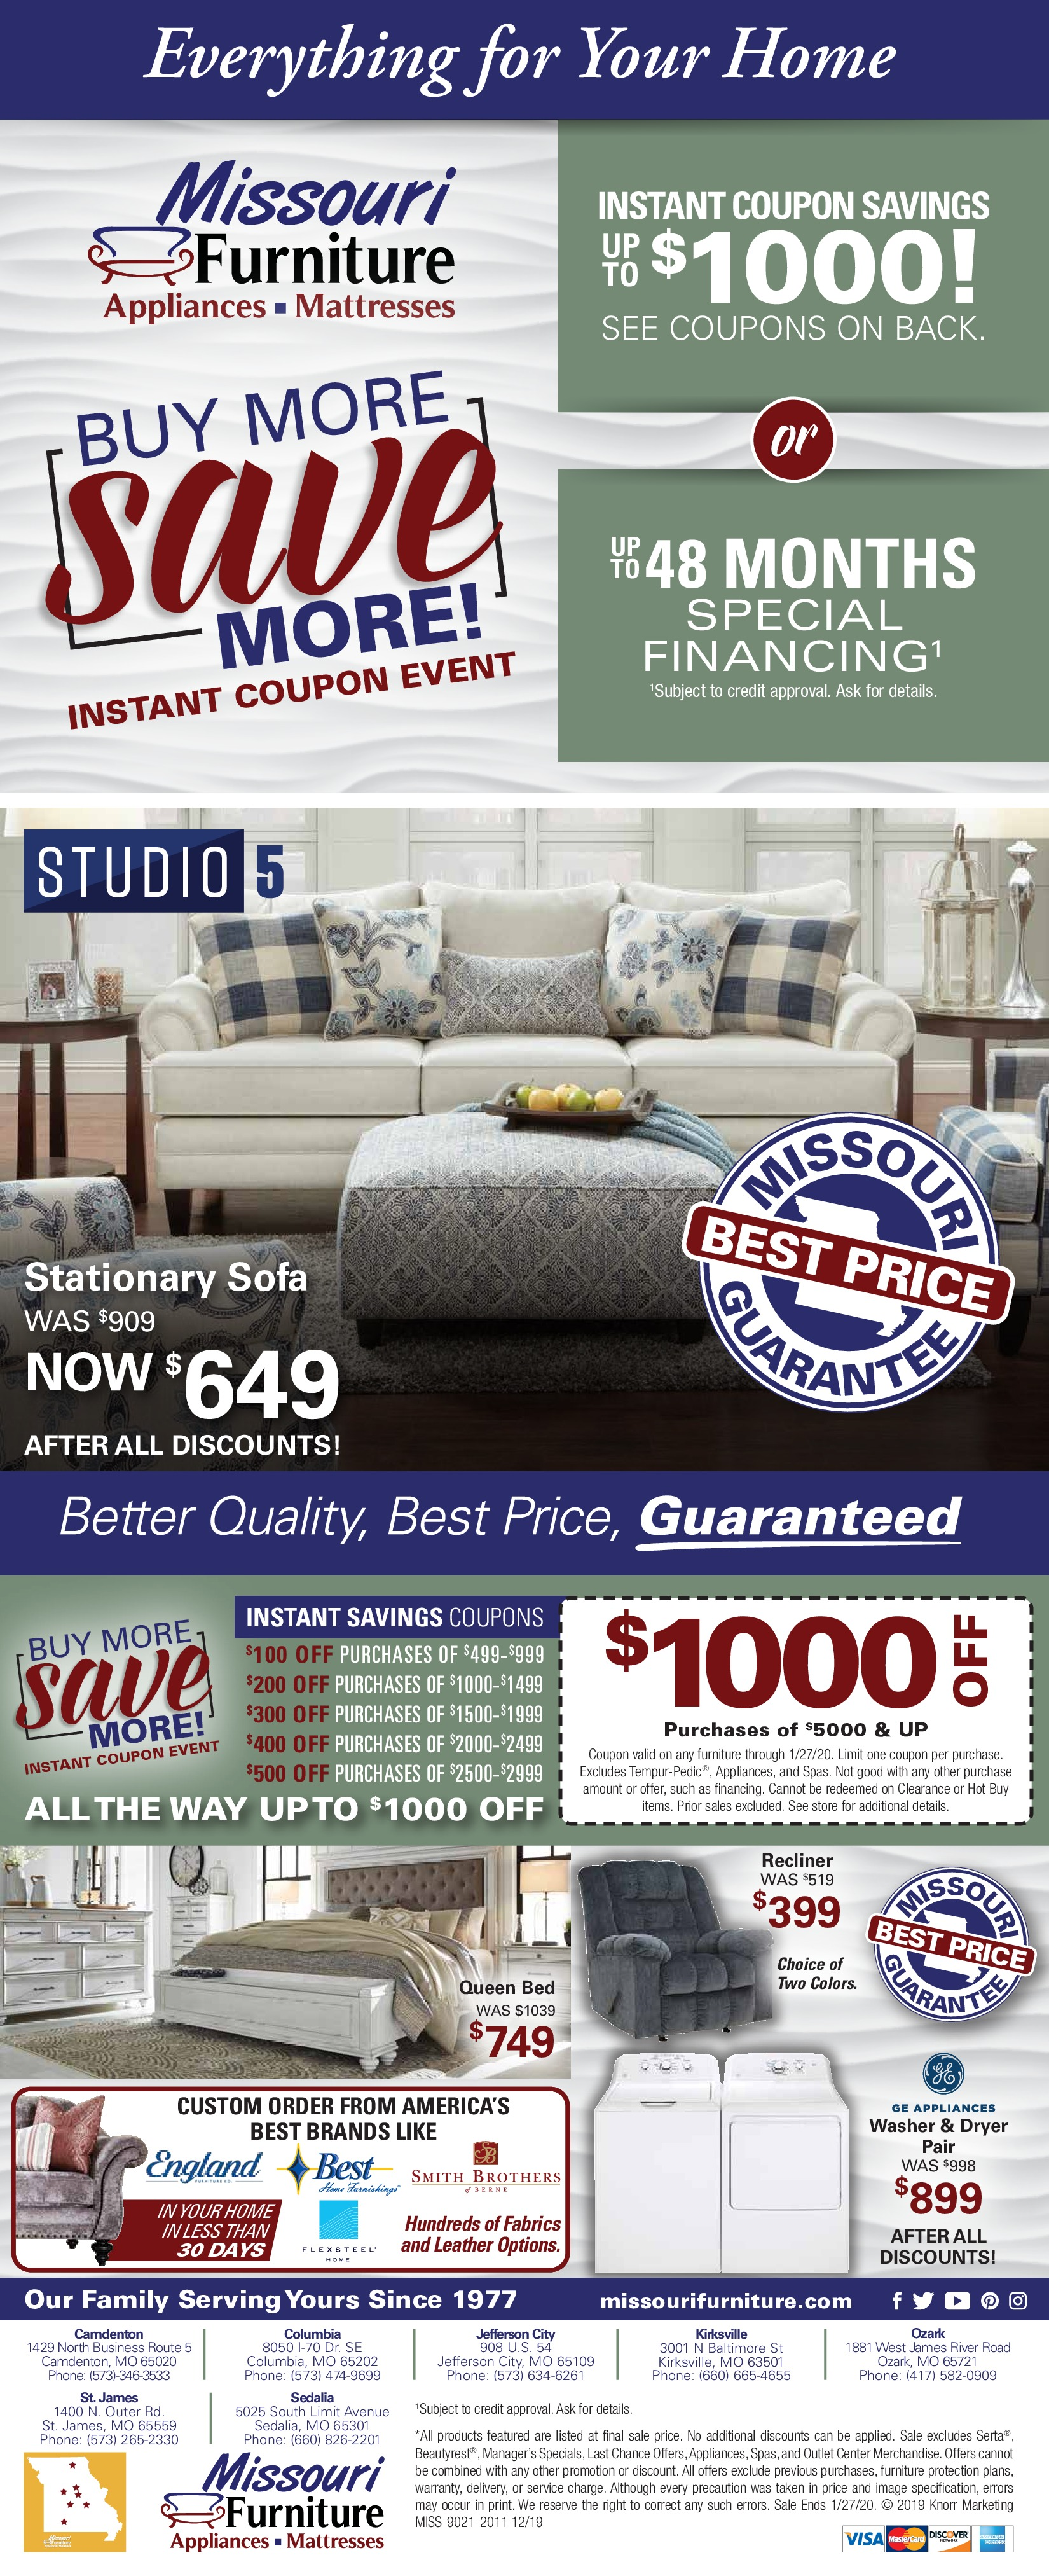 MISS-9021-2011-BuyMoreSaveMore-WEBSPECIAL